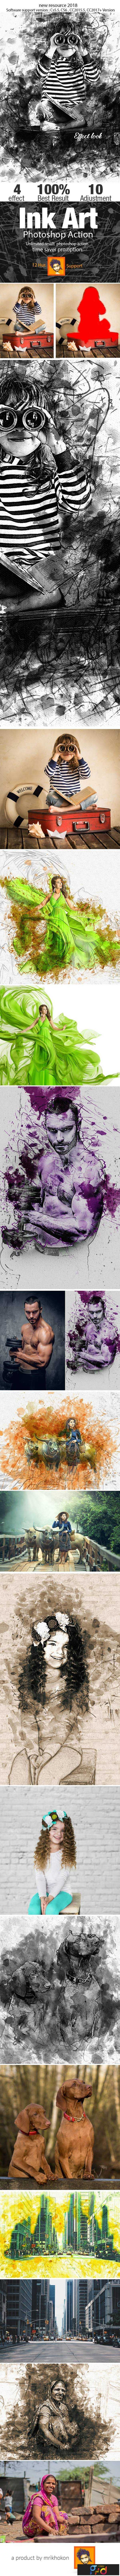 1806047 Ink Art Photoshop Action 21871329 1